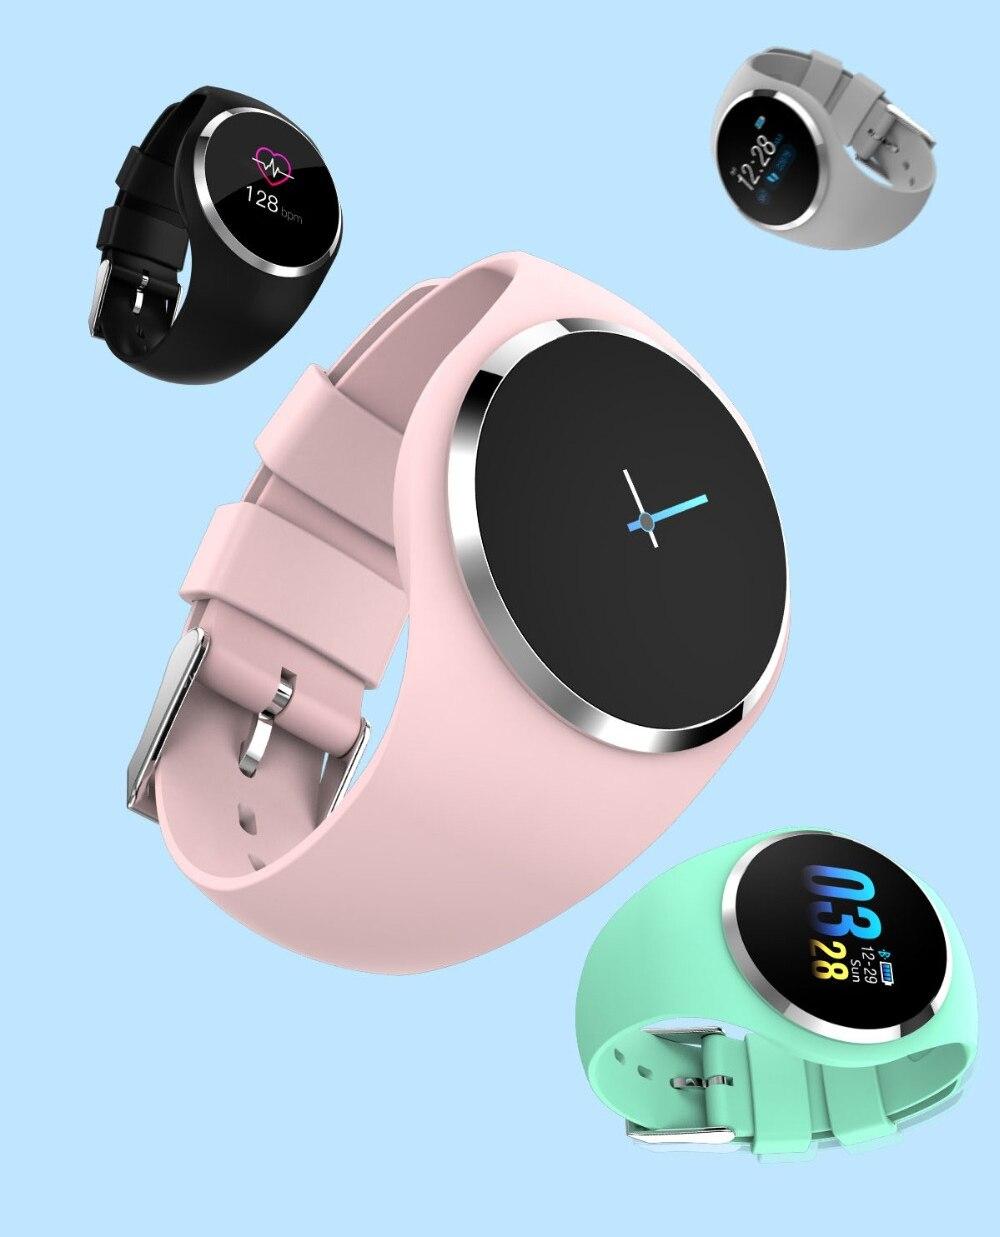 CYUC Q1 Smart Wristband Color LCD Screen Blood Pressure Heart Rate Monitor smart band Fitness Tracker Smart Bracelet ladies 2